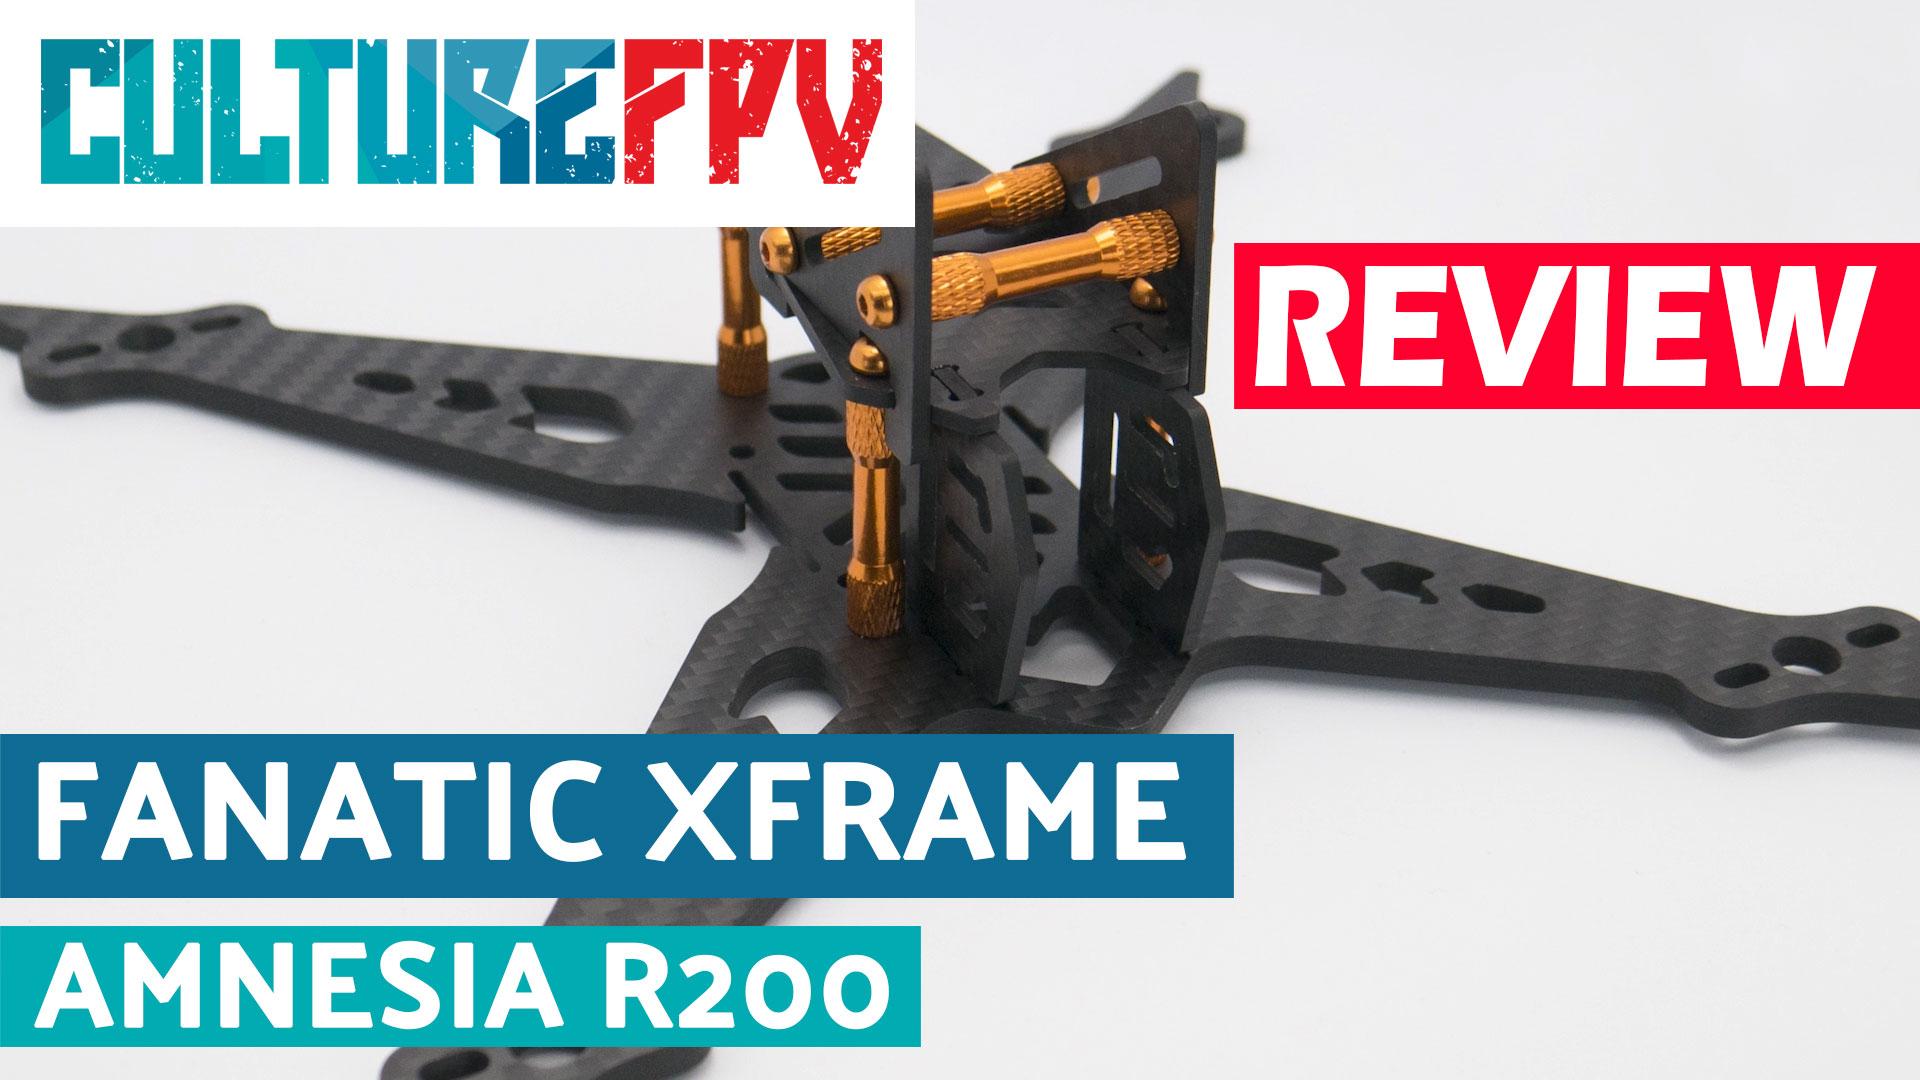 Fanatic xFrame Amnésia R200